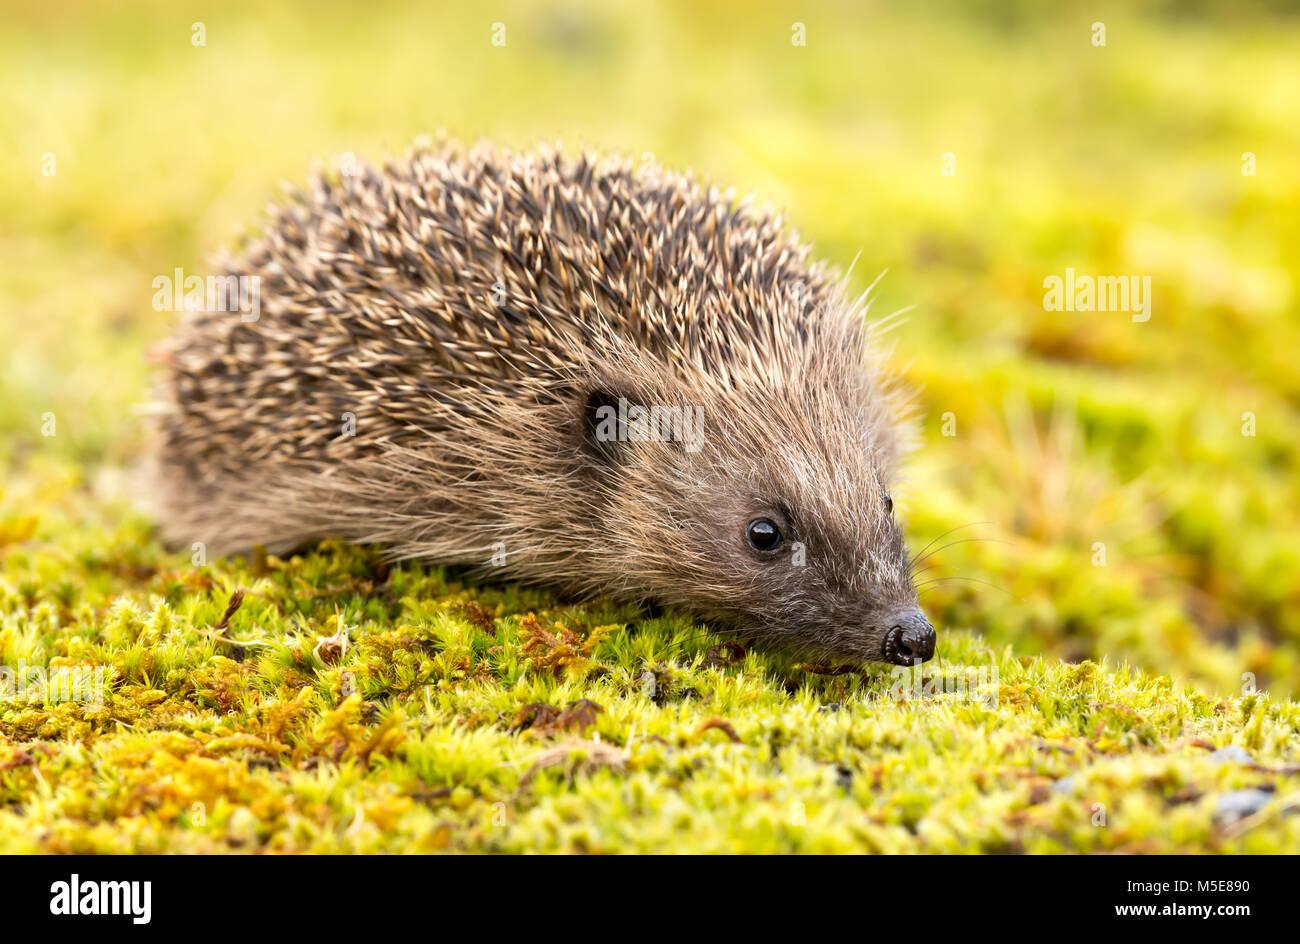 Hedgehog, UK, Native European Hedgehog on Green moss - Stock Image